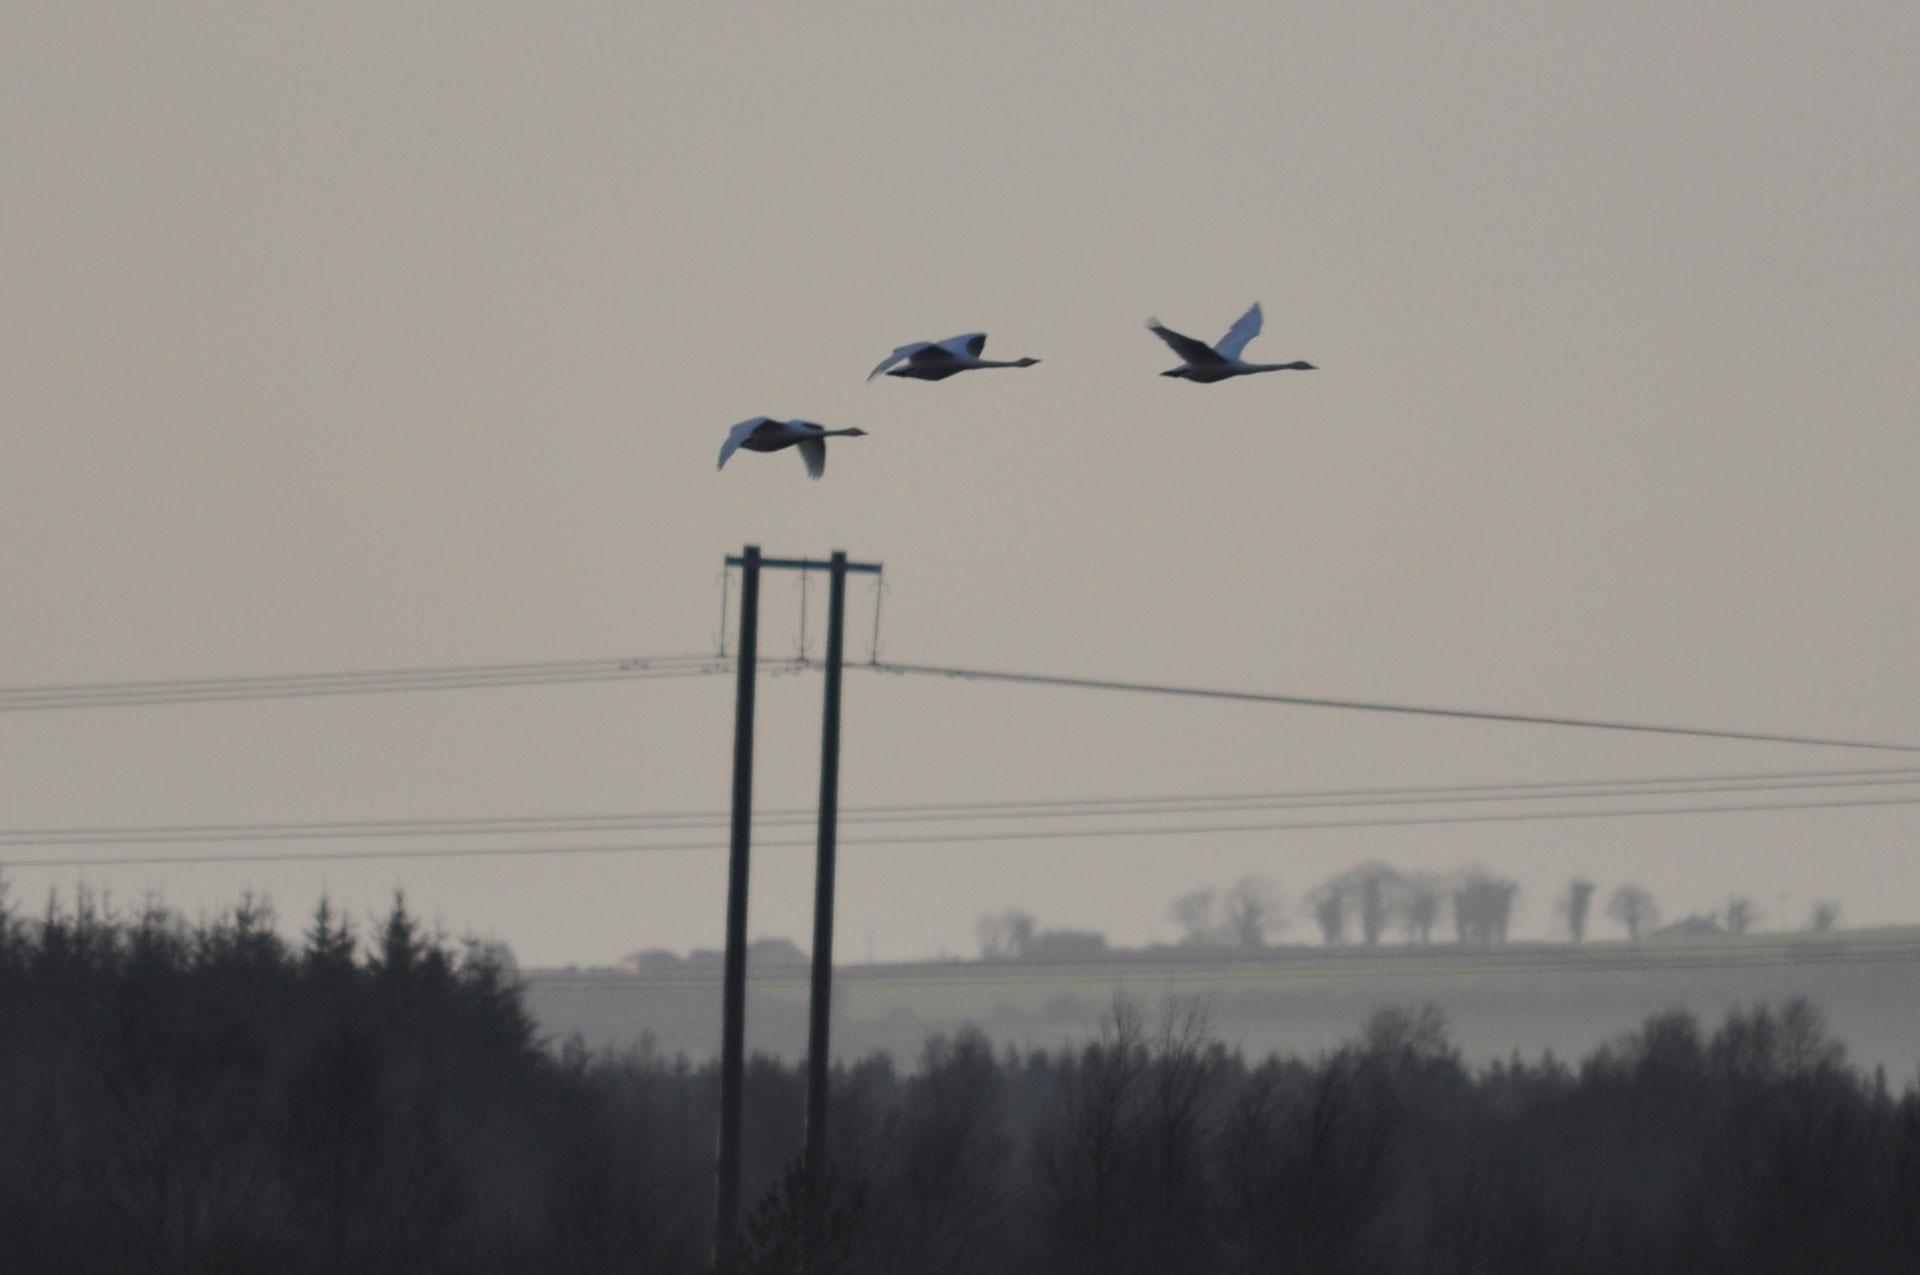 Impact of birds on power lines 62